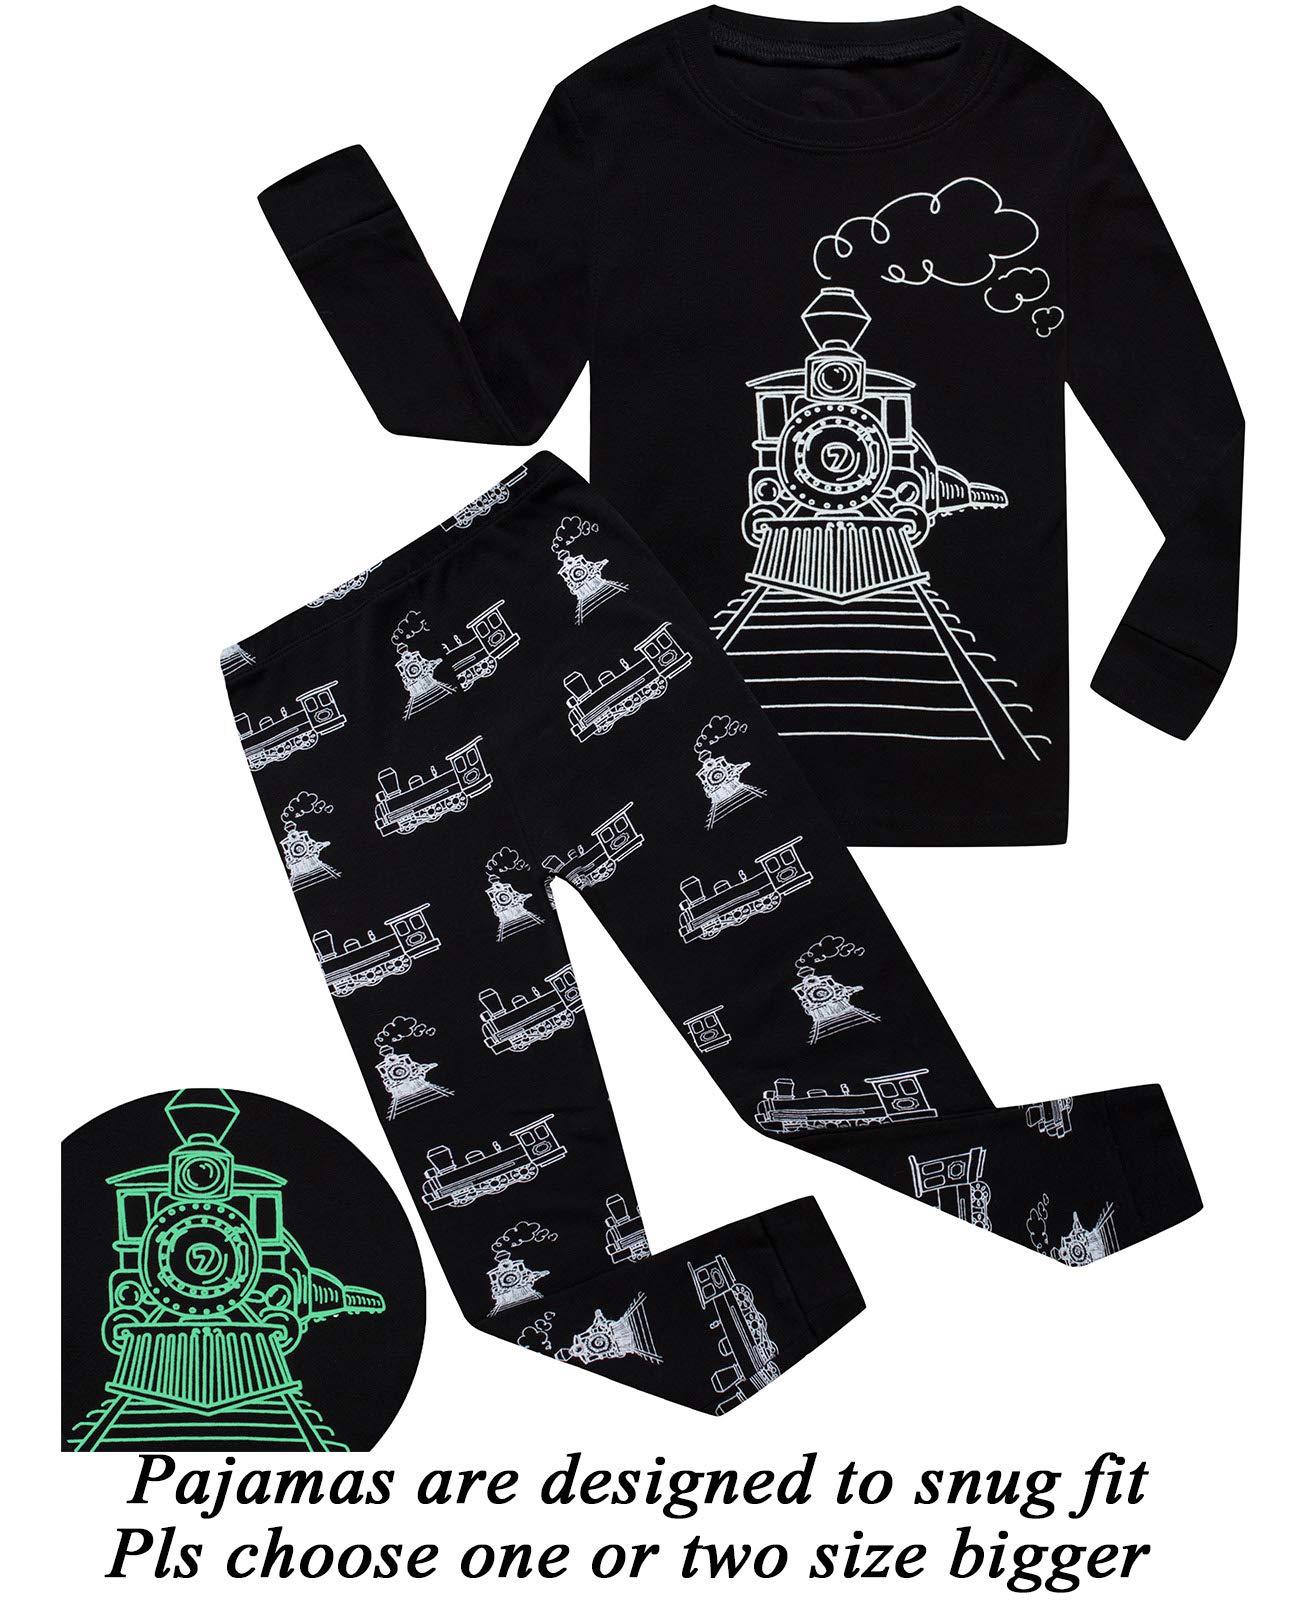 8c111f10217 Galleon - Little Pajamas Boys Sleepwear Train Glow-in-The-Dark Toddler Pjs  Kids Clothes Size 8T